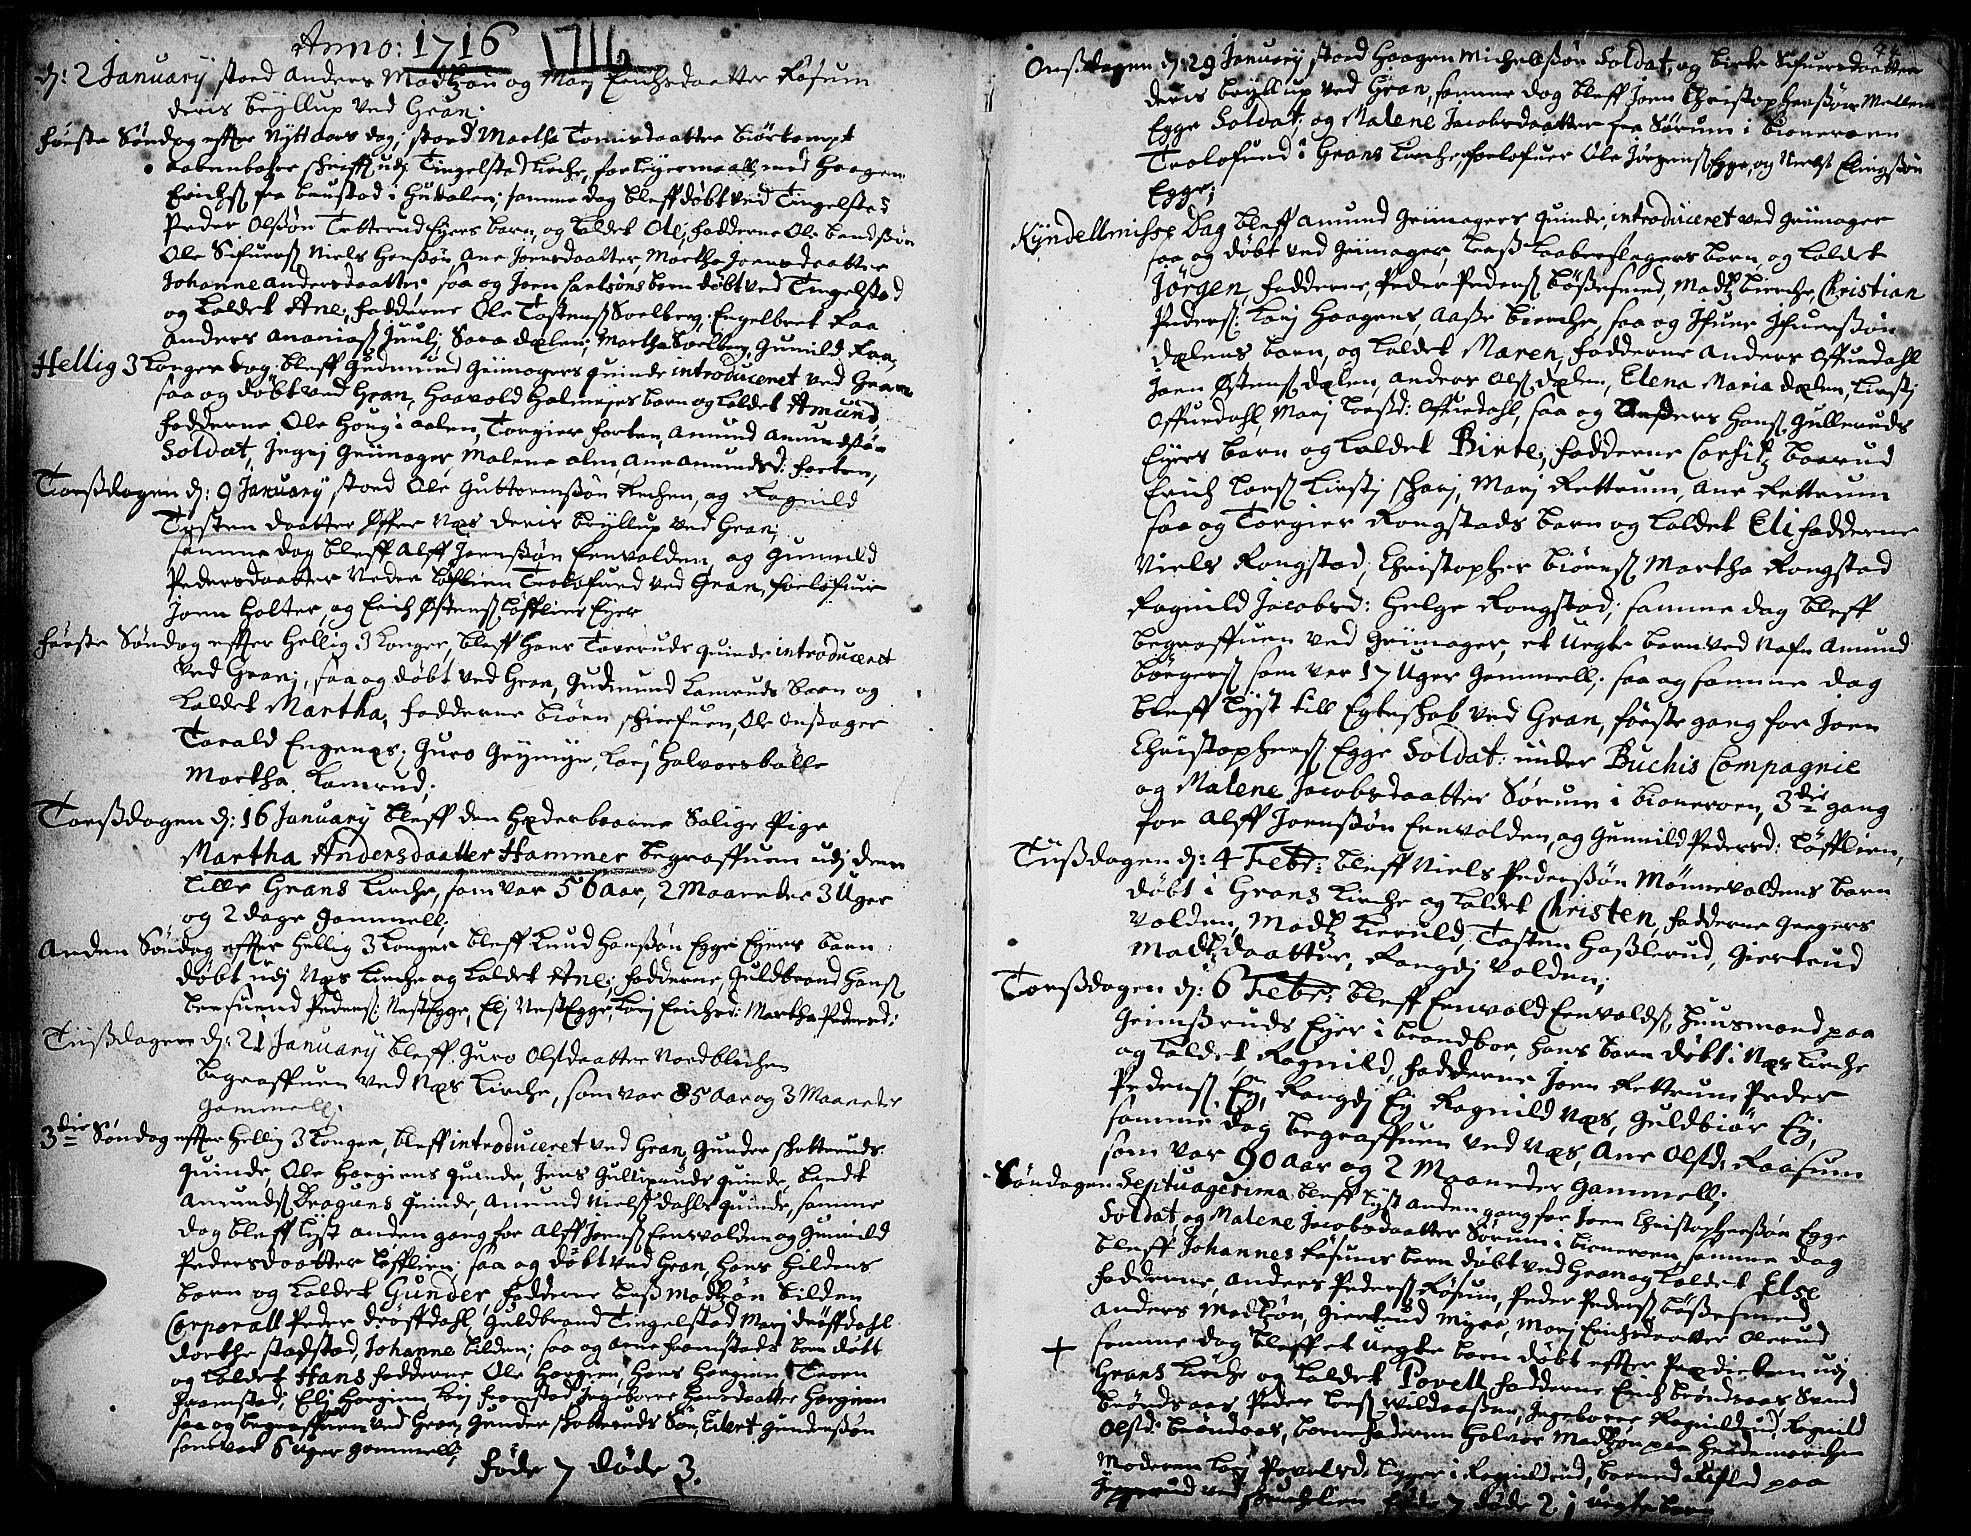 SAH, Gran prestekontor, Ministerialbok nr. 1, 1707-1731, s. 74